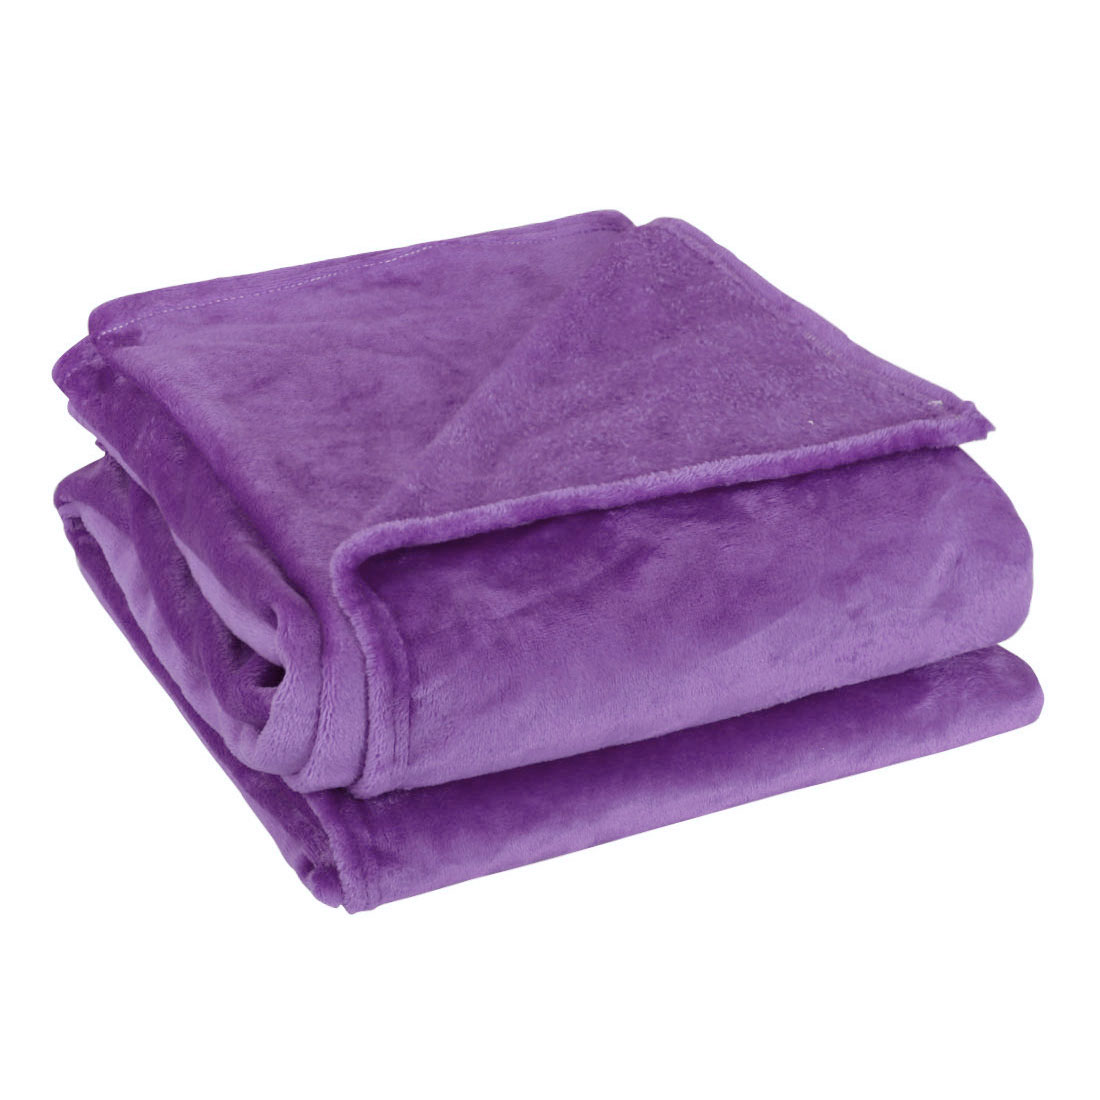 Dark Purple 71 X 78 Inch Home Bed Sofa Soft Fleece Throws